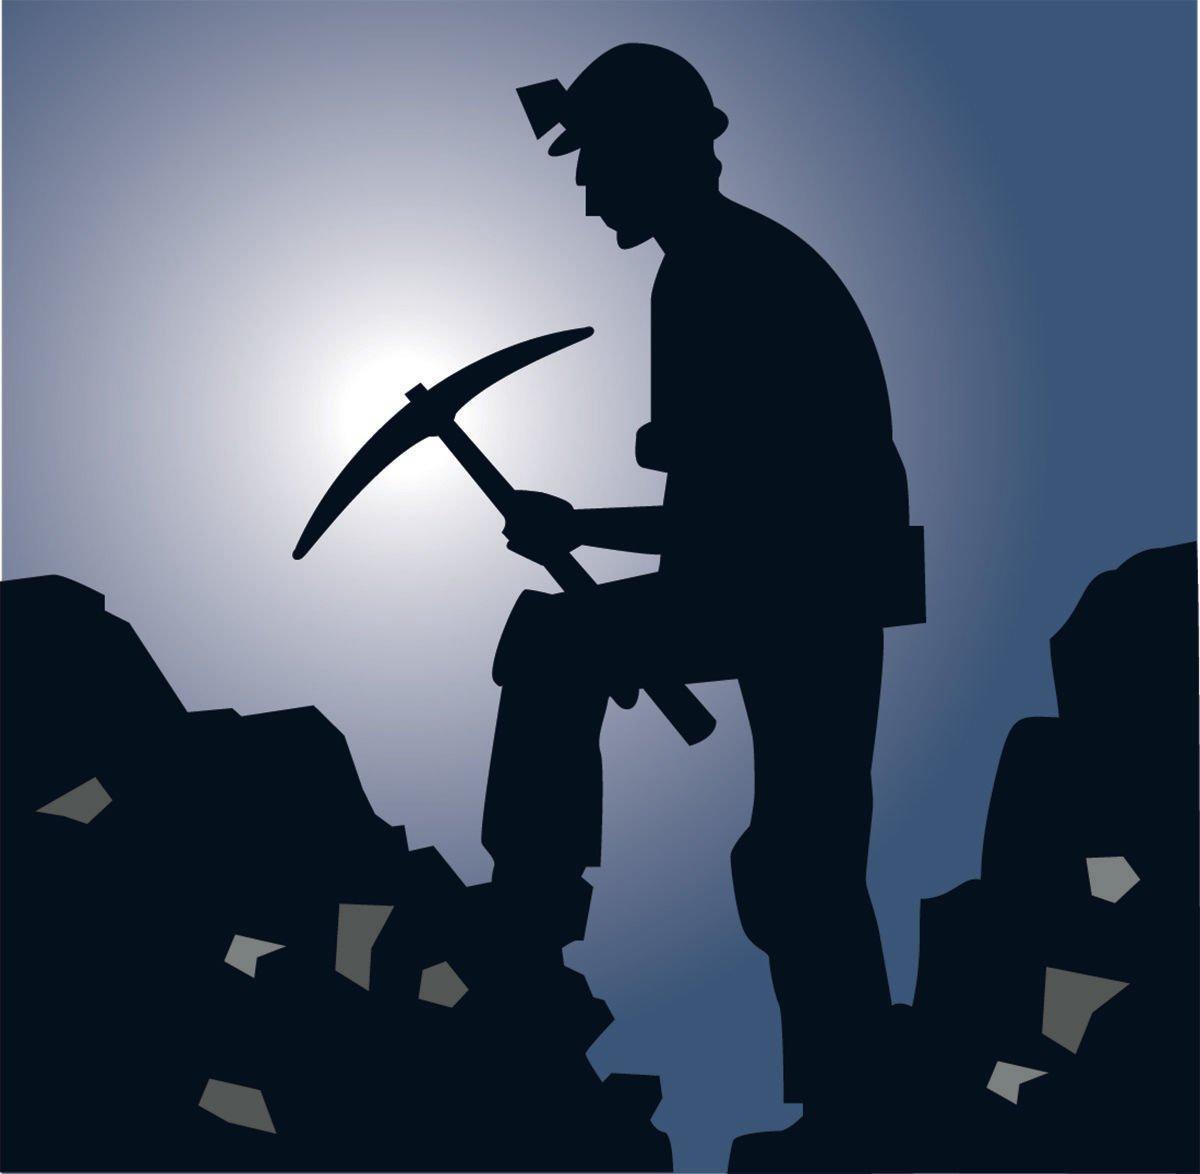 Miner silhouette